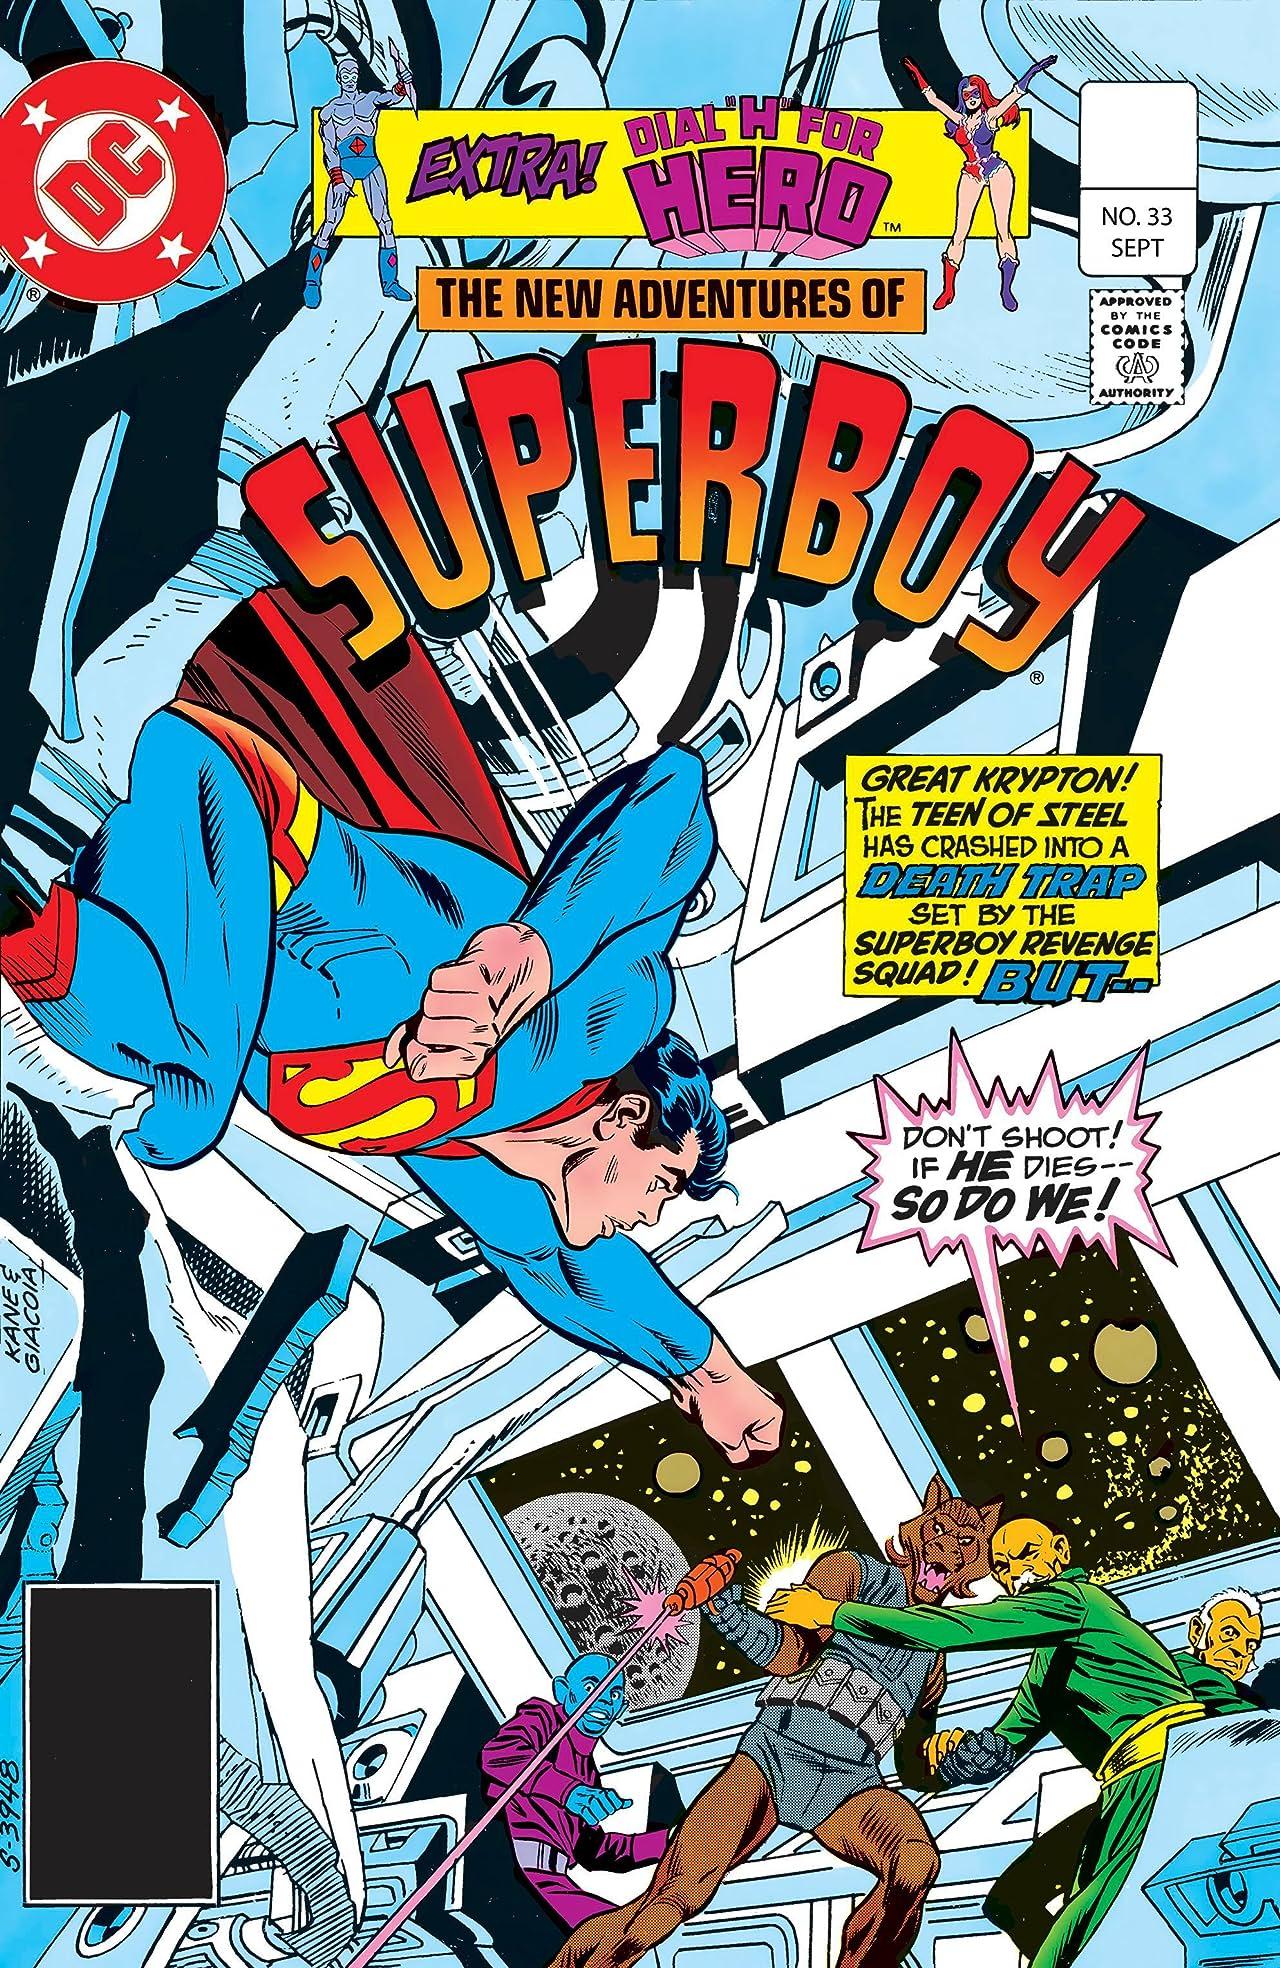 New Adventures of Superboy (1980-1984) #33